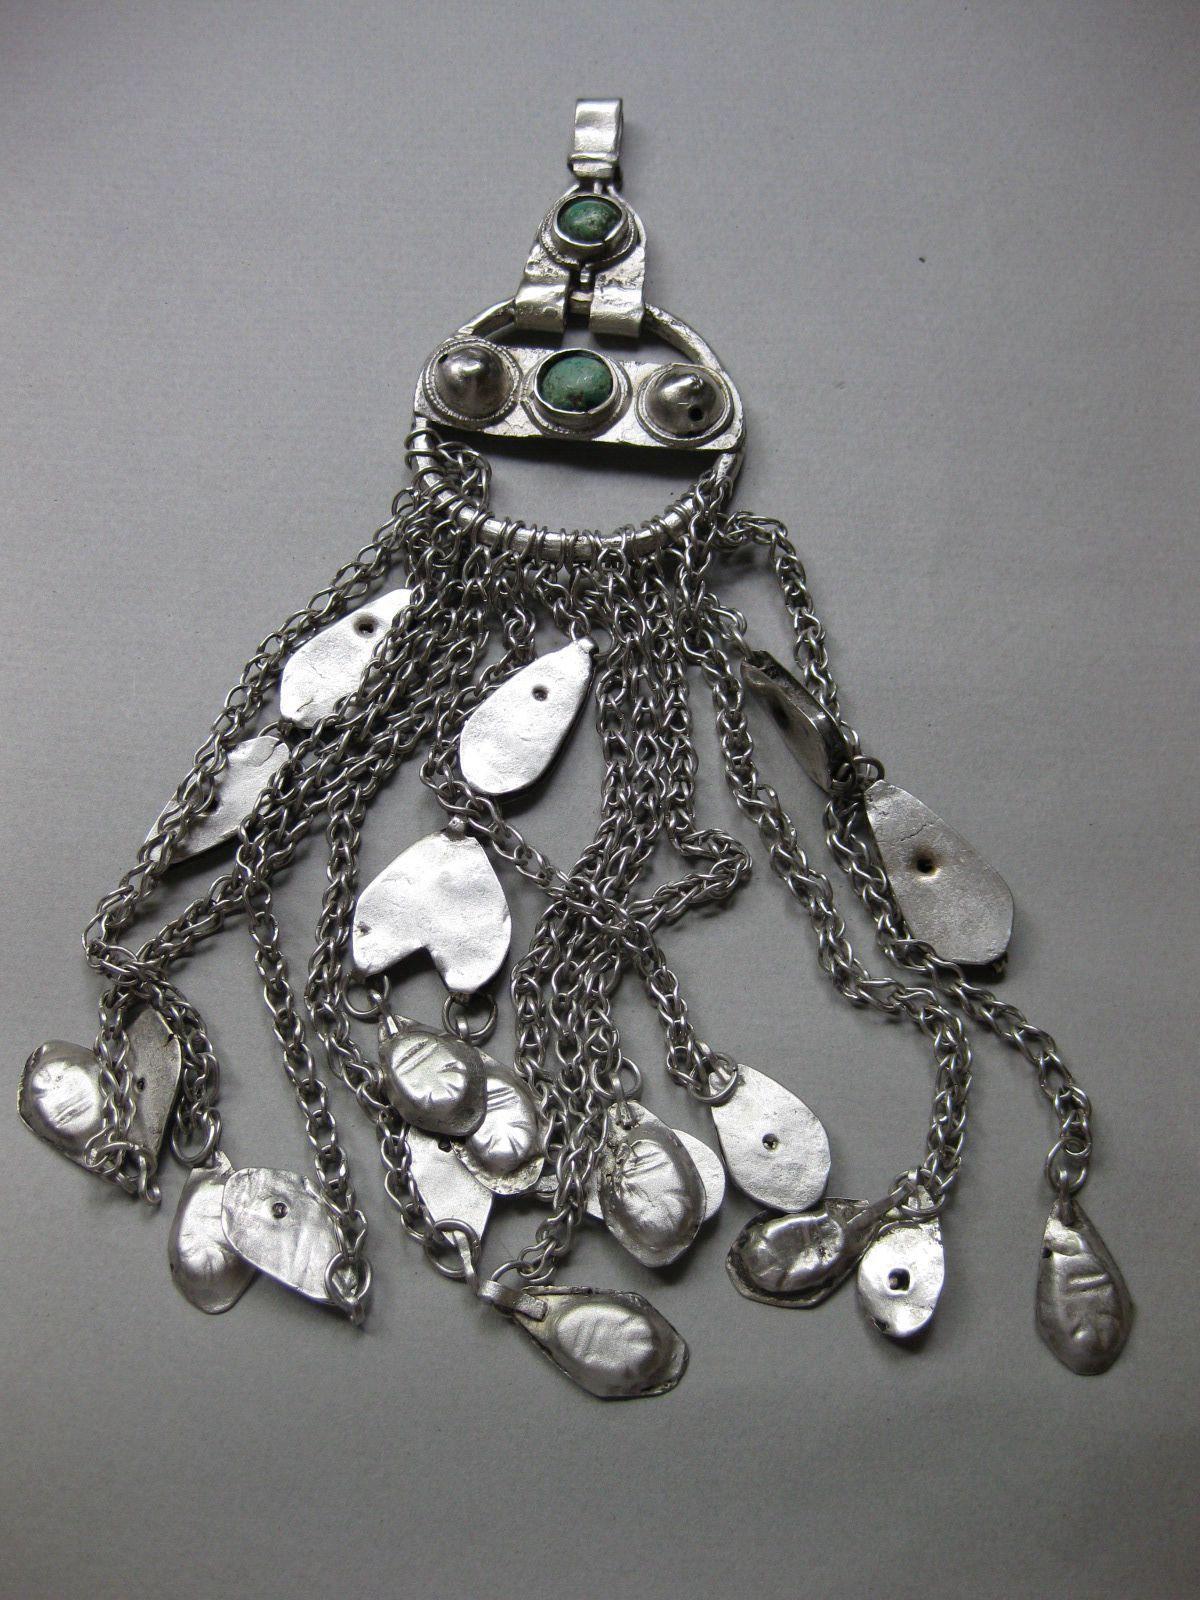 A Silver Saudi Arabian Hair Decoration. Khaneikey.com